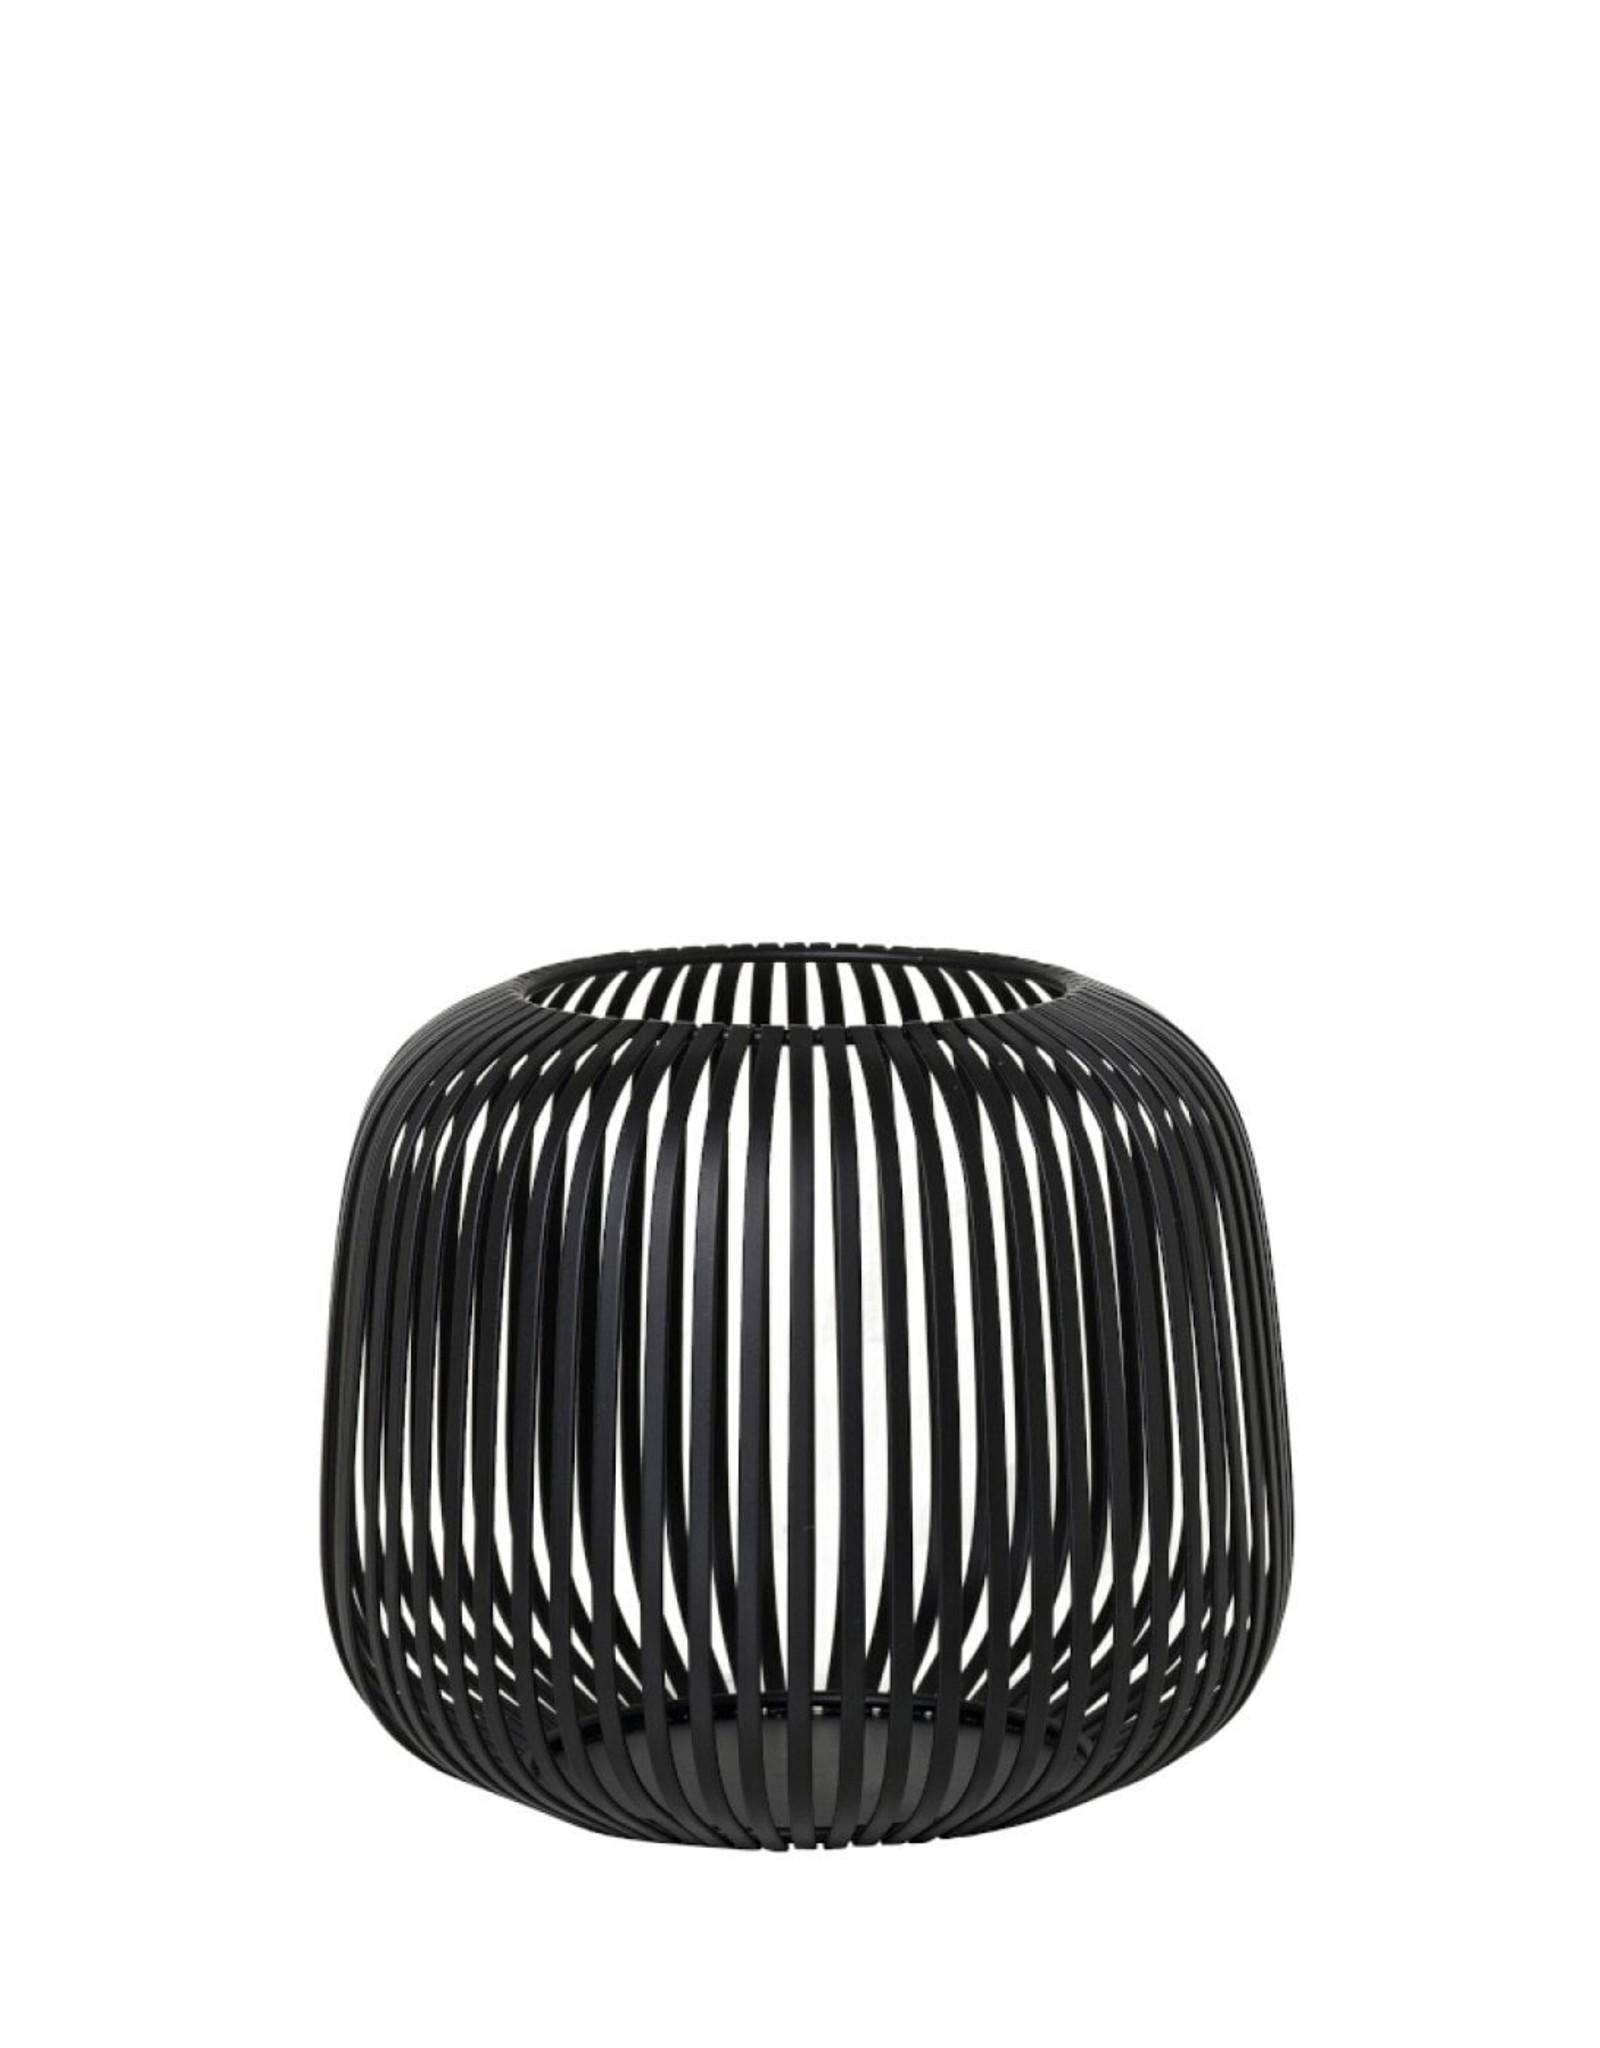 Blomus BLOMUS - LITO windlicht / lantaarn zwart staal Ø20,5 cm Small